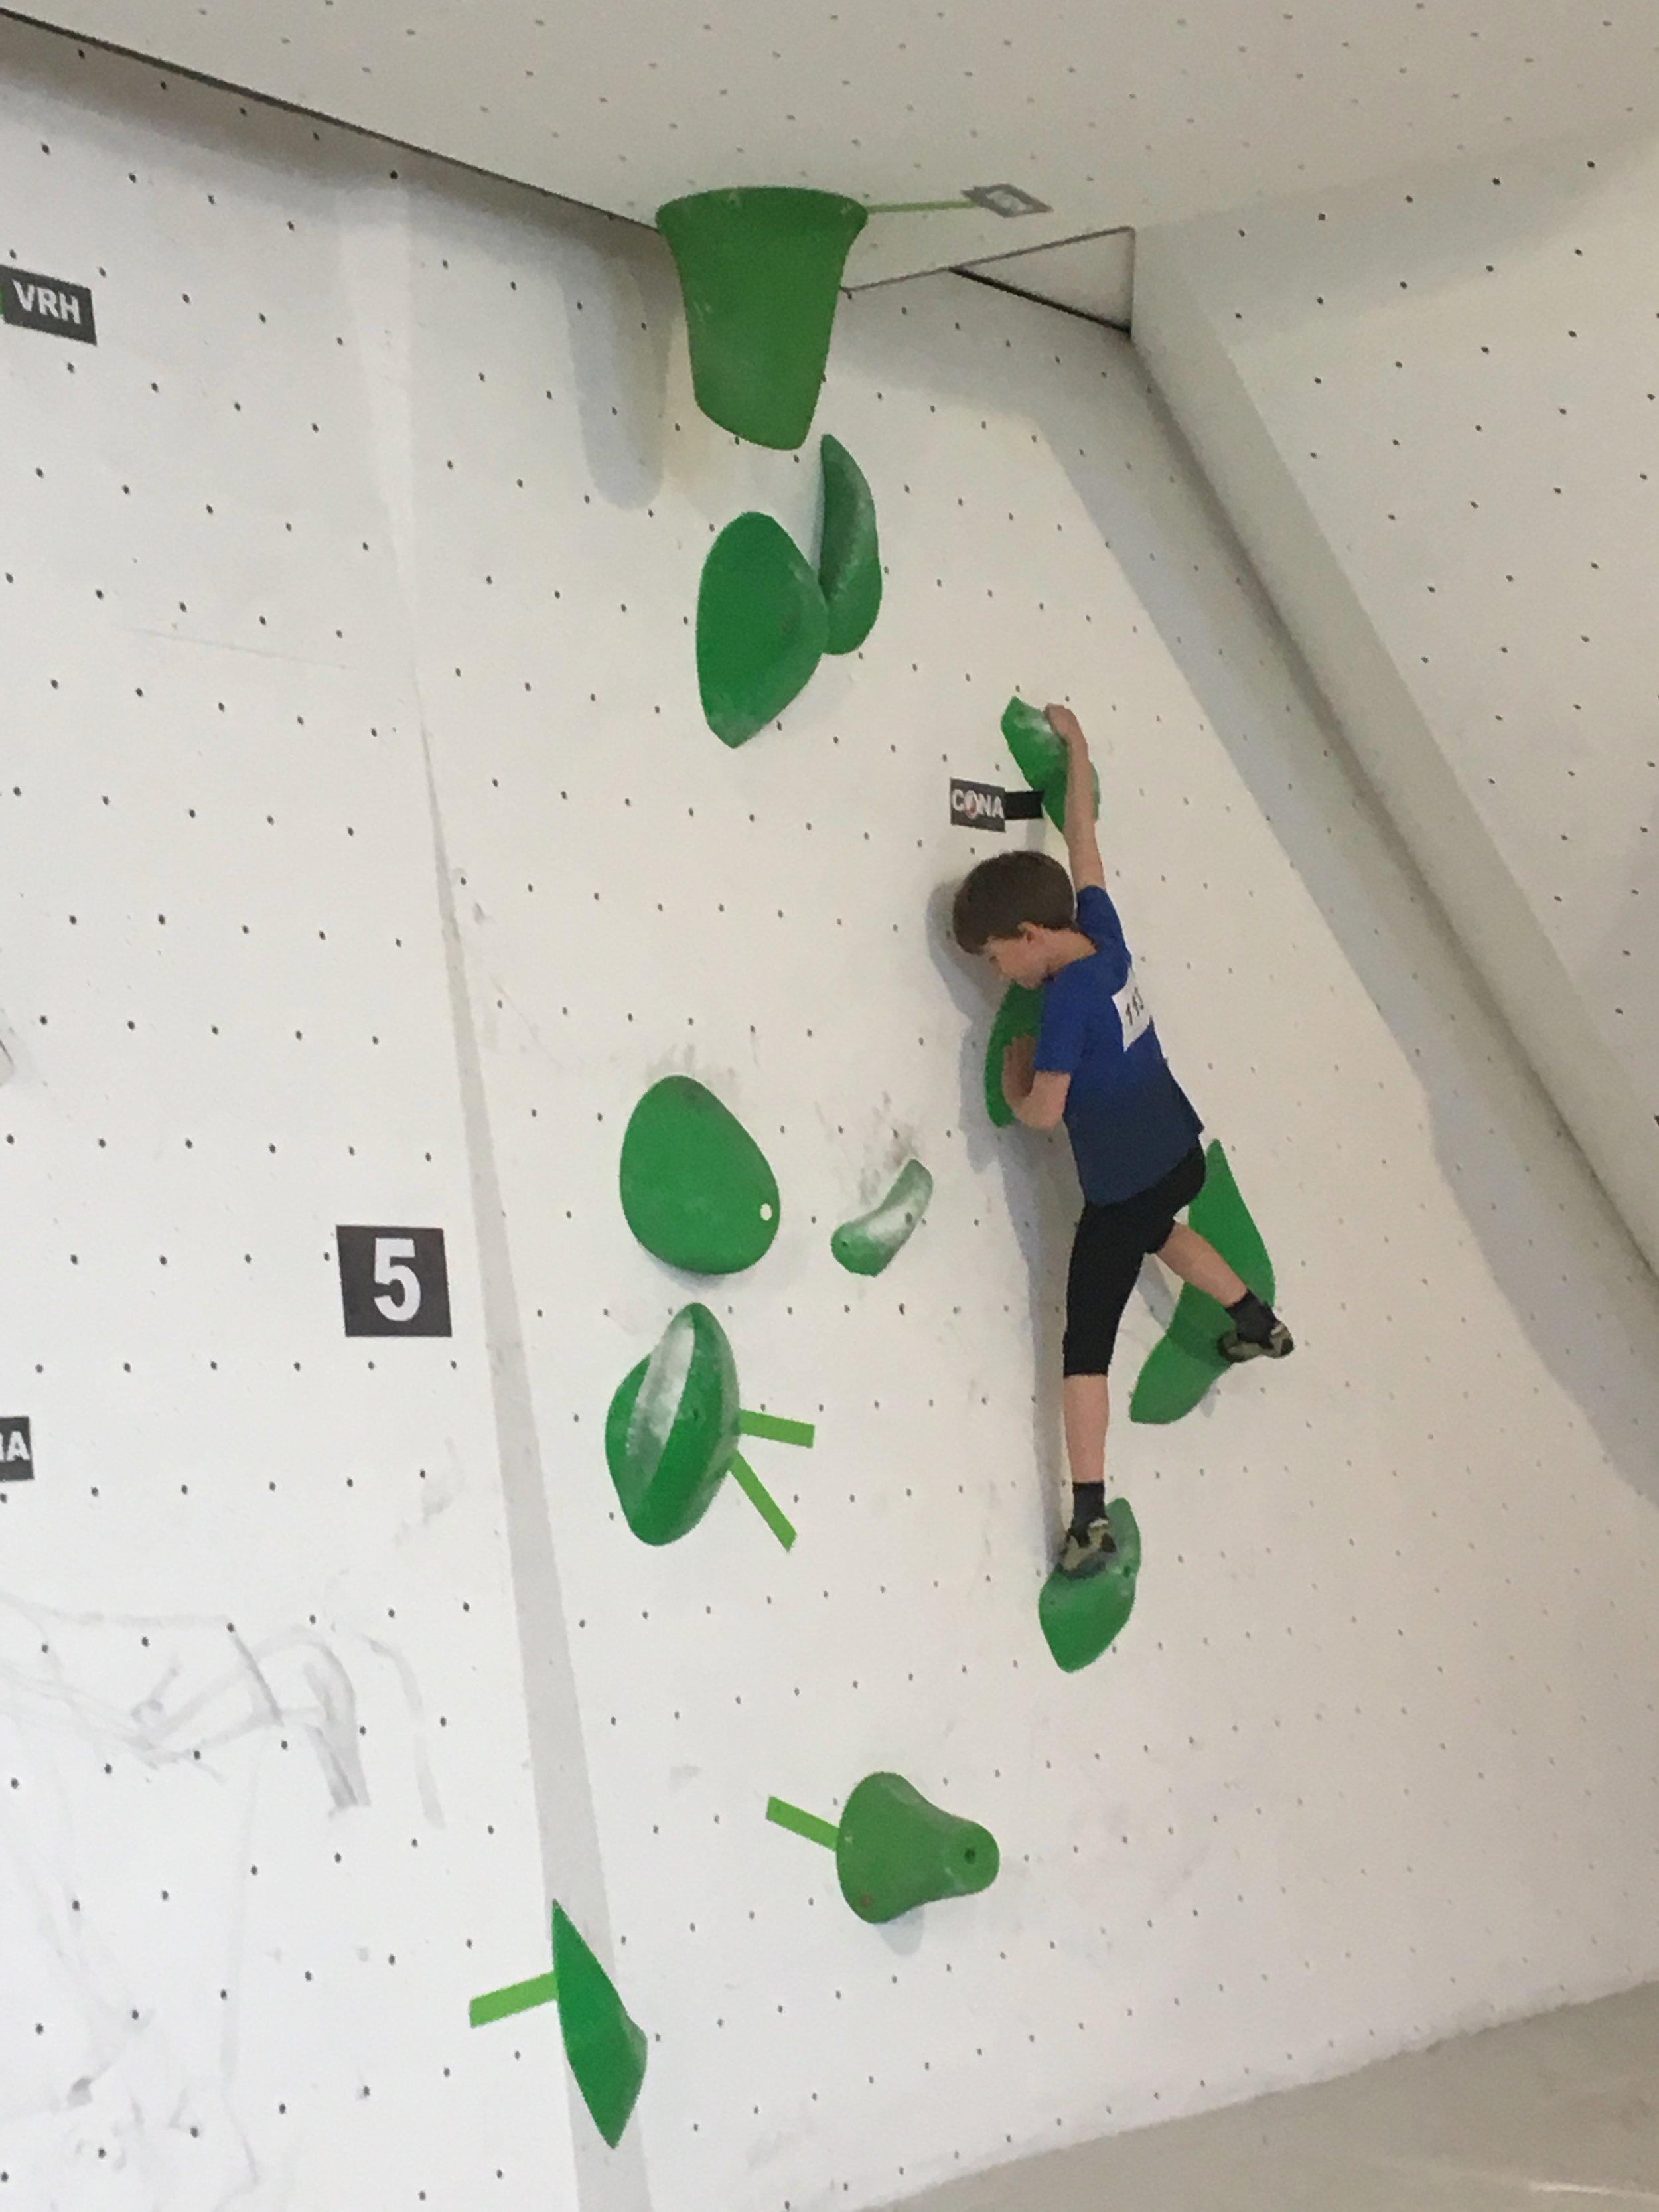 Plezalni tekma Grif Kamnik 2019_189.jpg